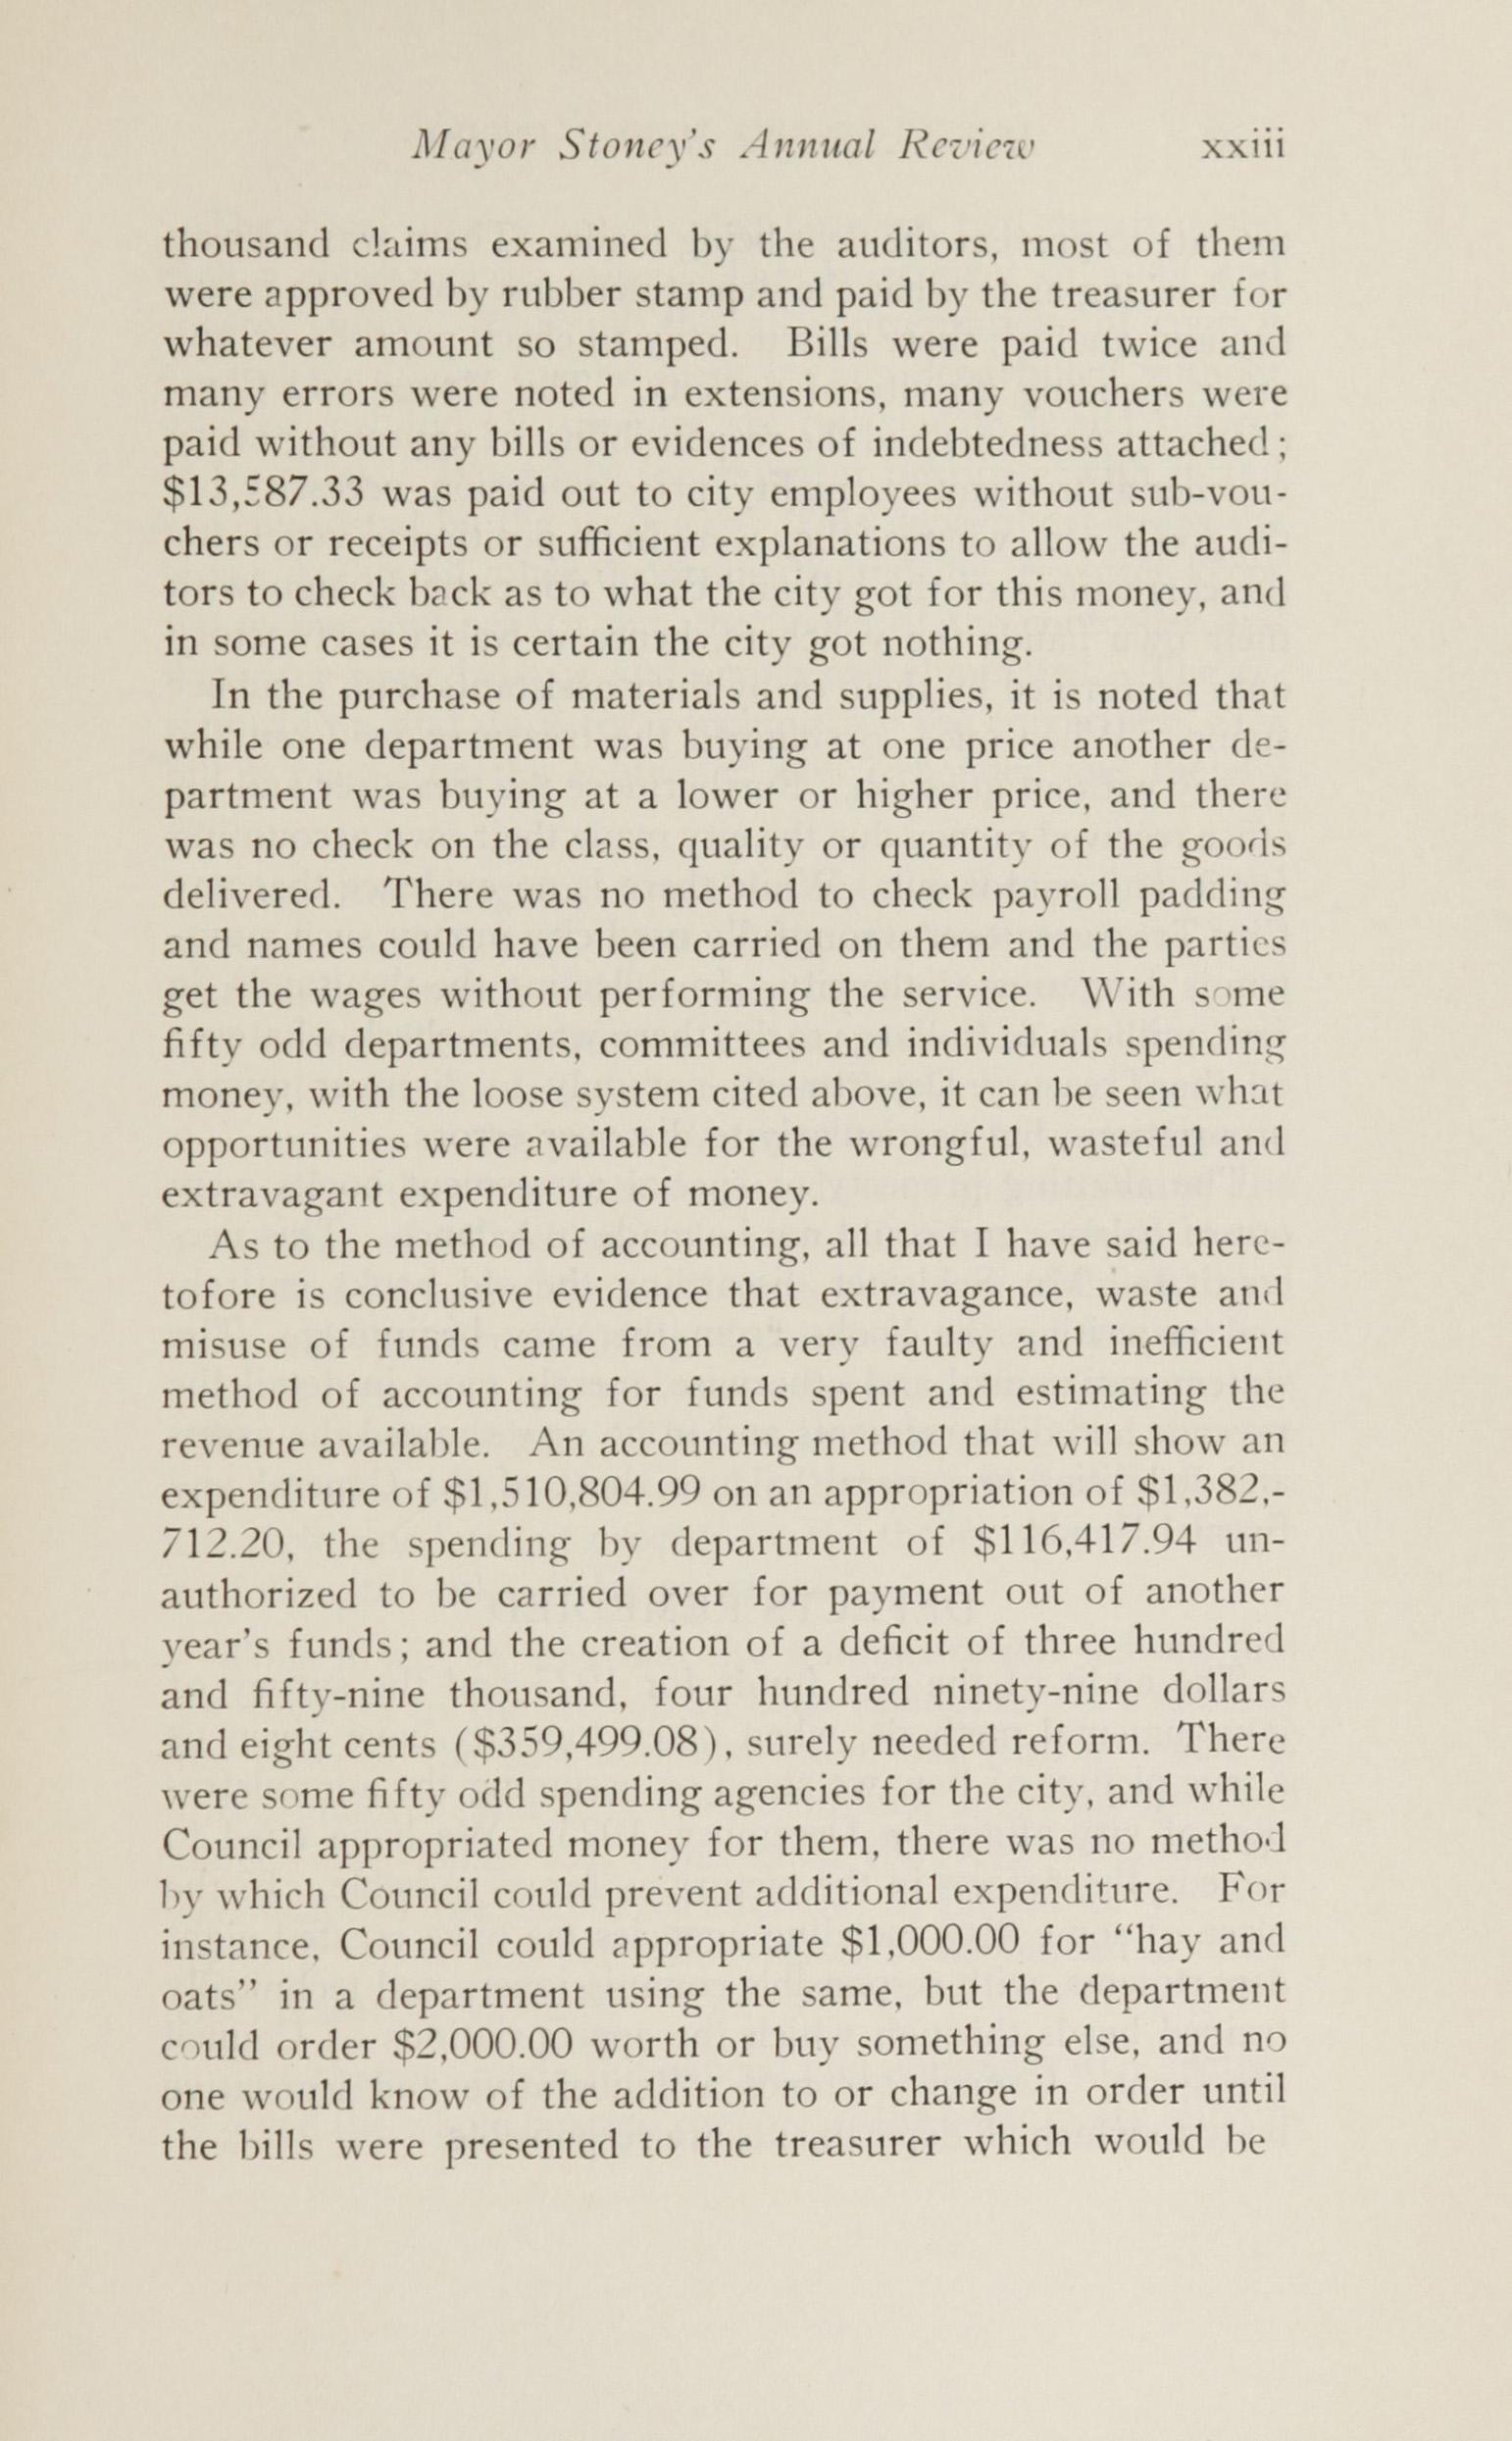 Charleston Yearbook, 1924, page xxiii